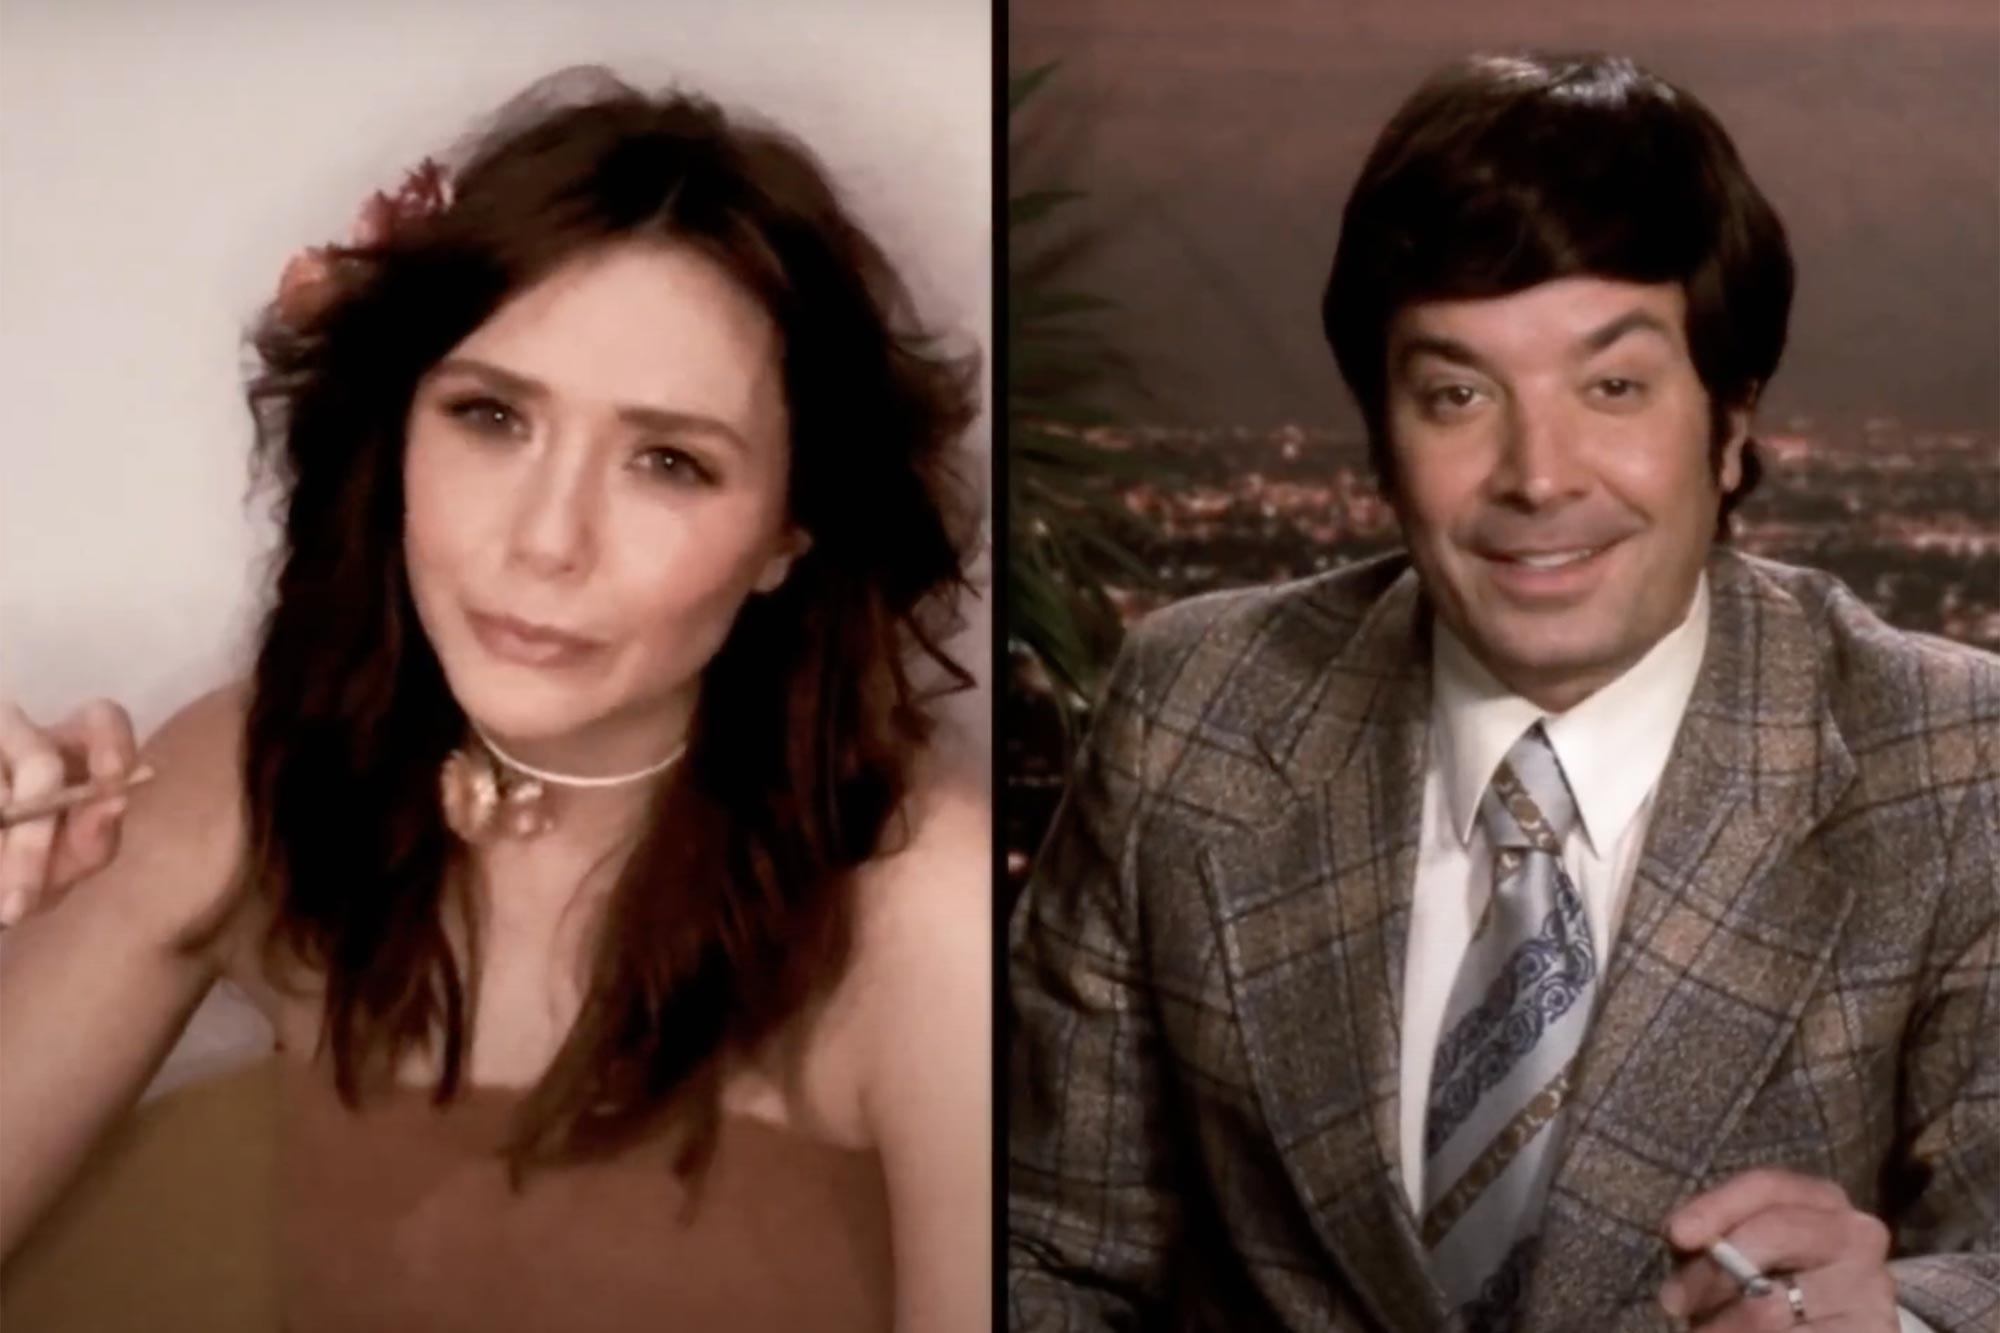 FallonVision with Elizabeth Olsen (WandaVision Parody) | The Tonight Show